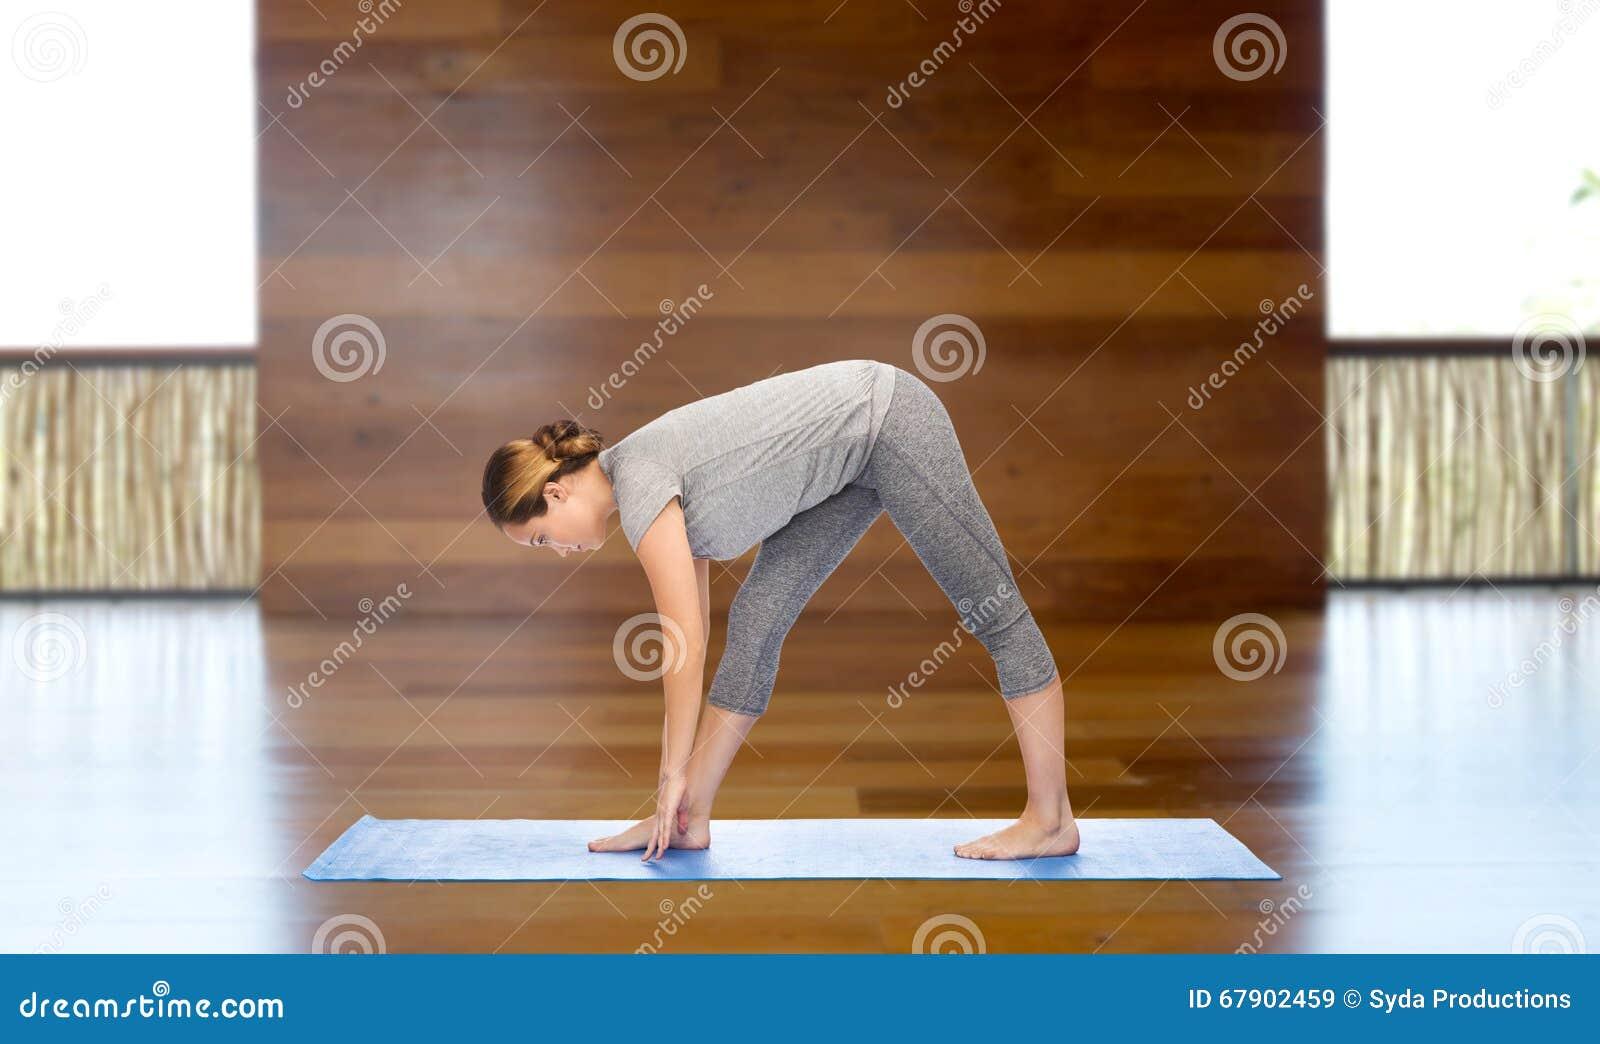 Intense Stretch Pose Royalty-Free Stock Photo ...